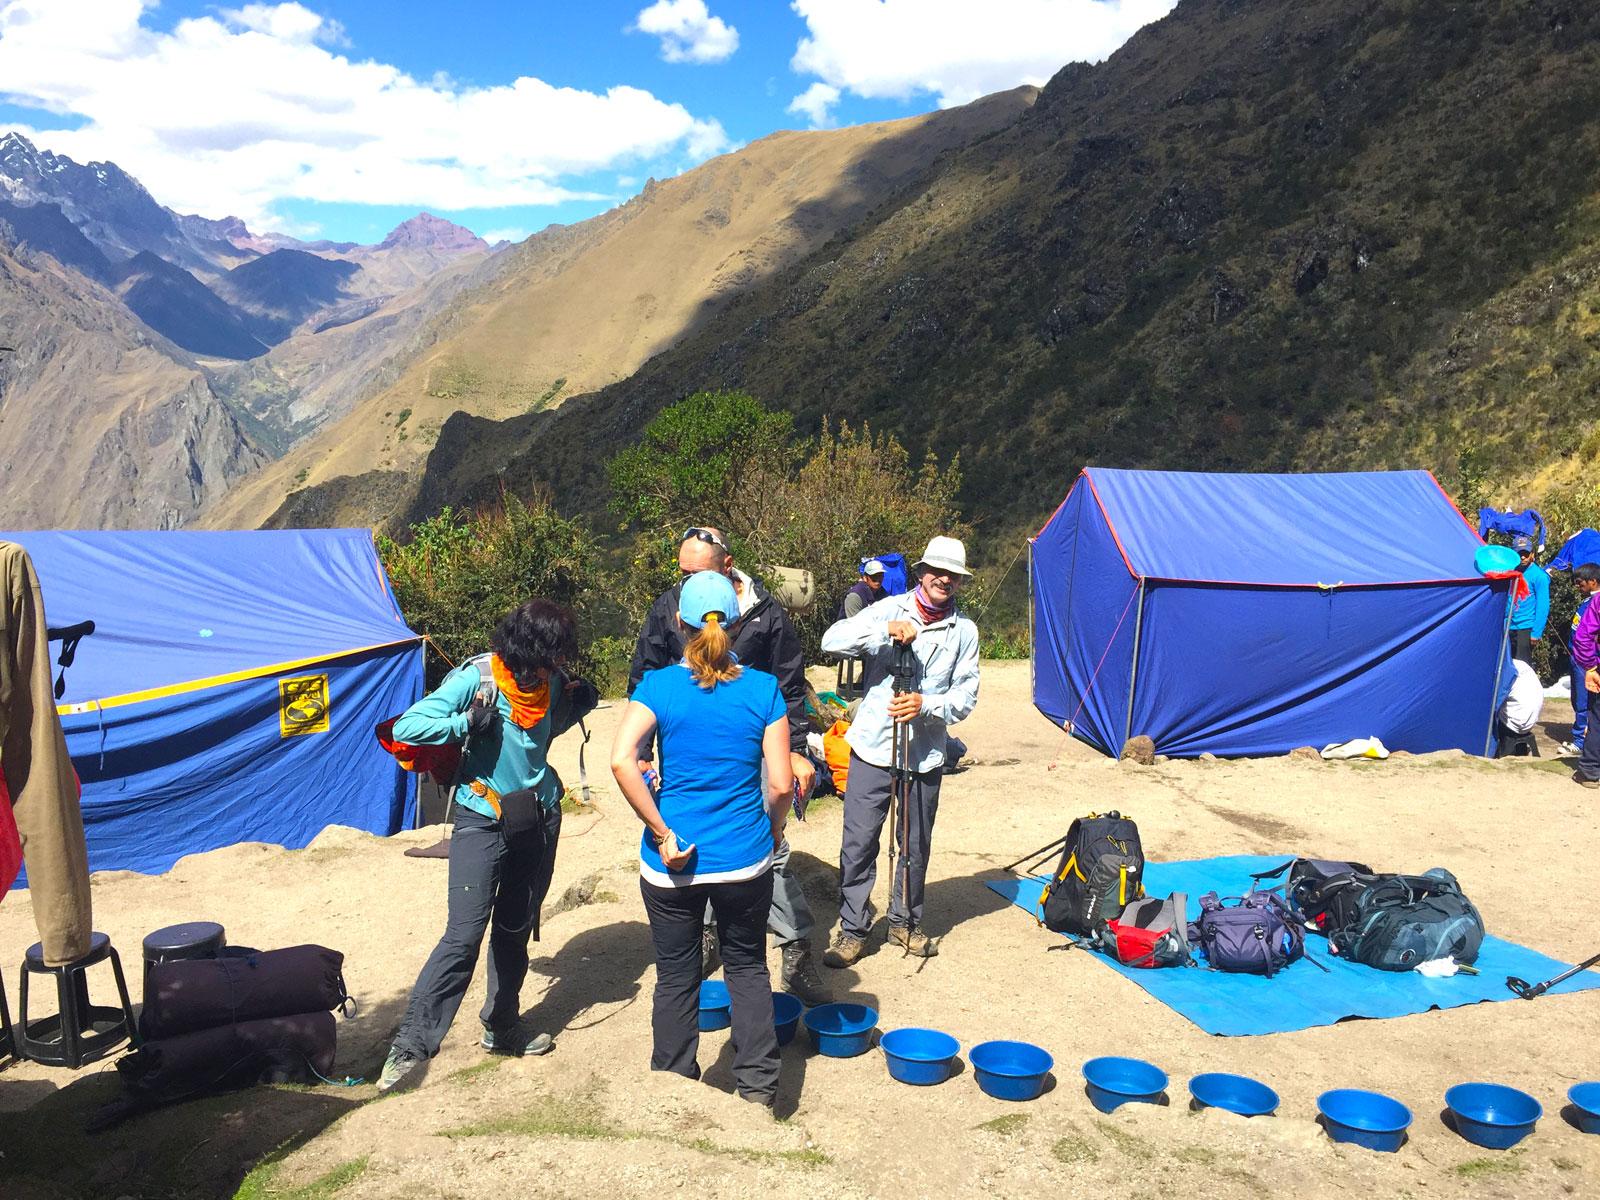 Campsite along the Inca Trail